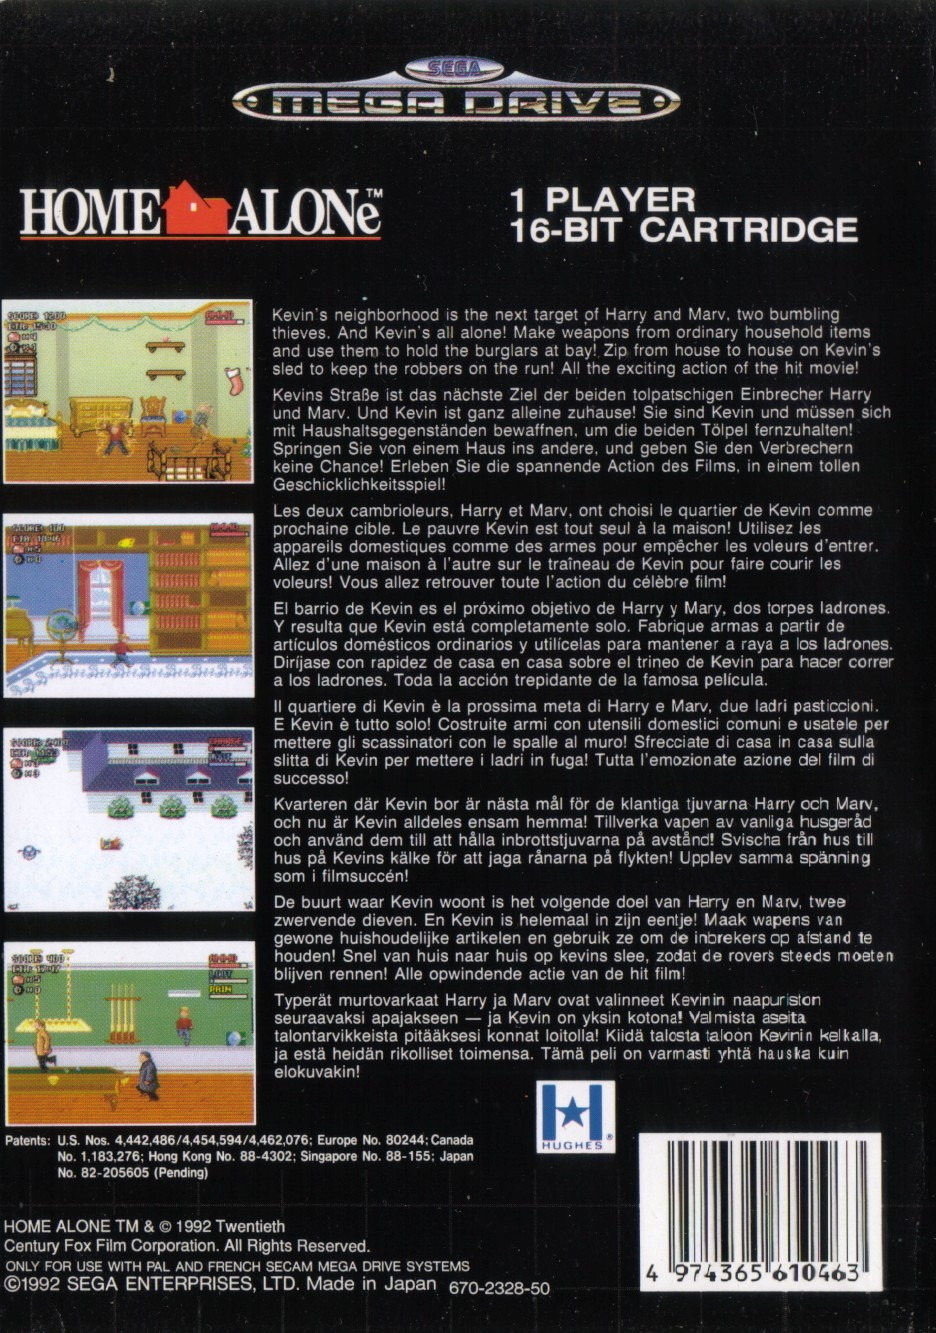 Back boxart of the game Home Alone (Europe) on Sega Megadrive